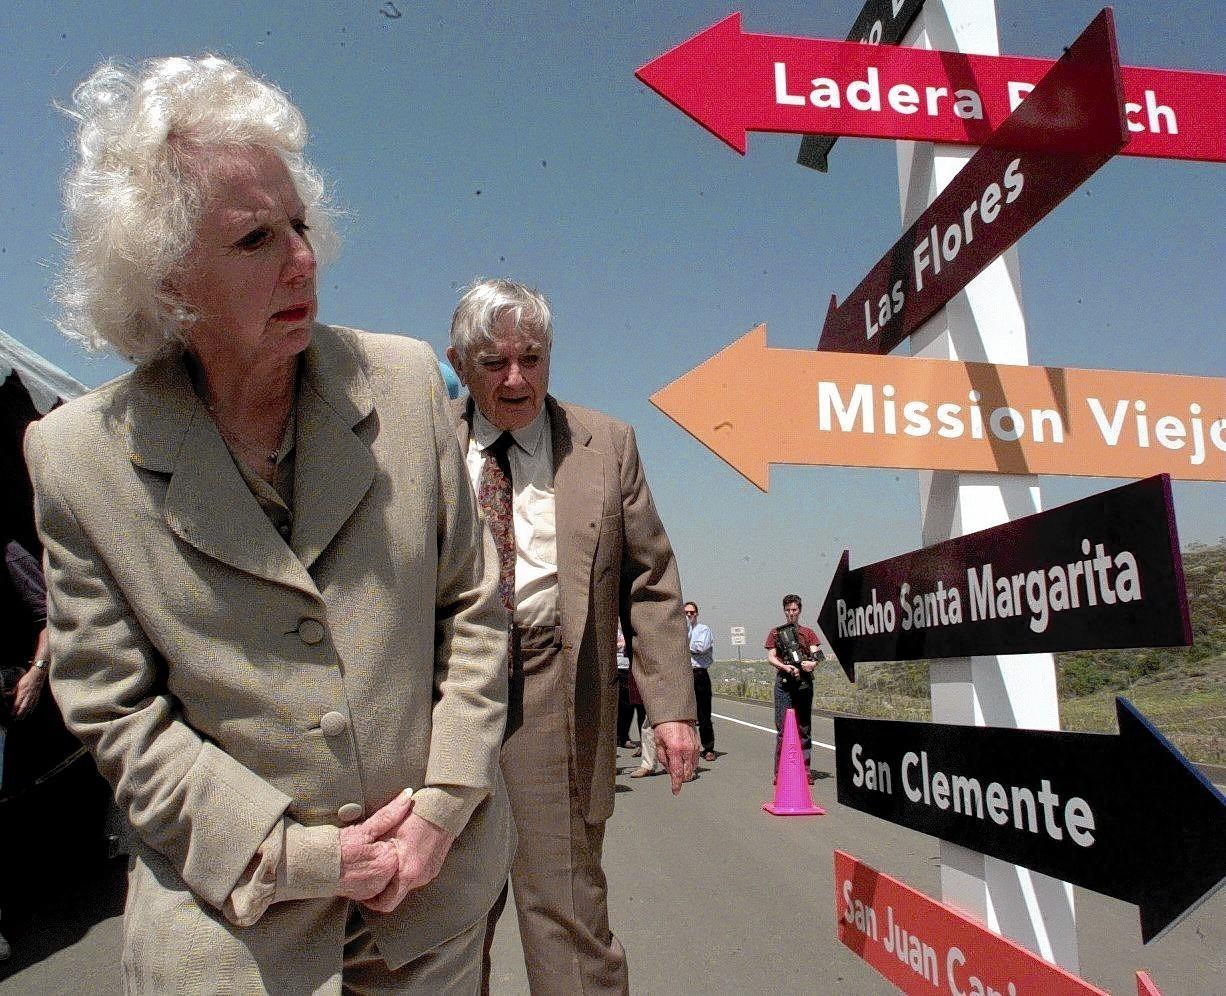 alice o u0026 39 neill avery dies at 97  california landowner